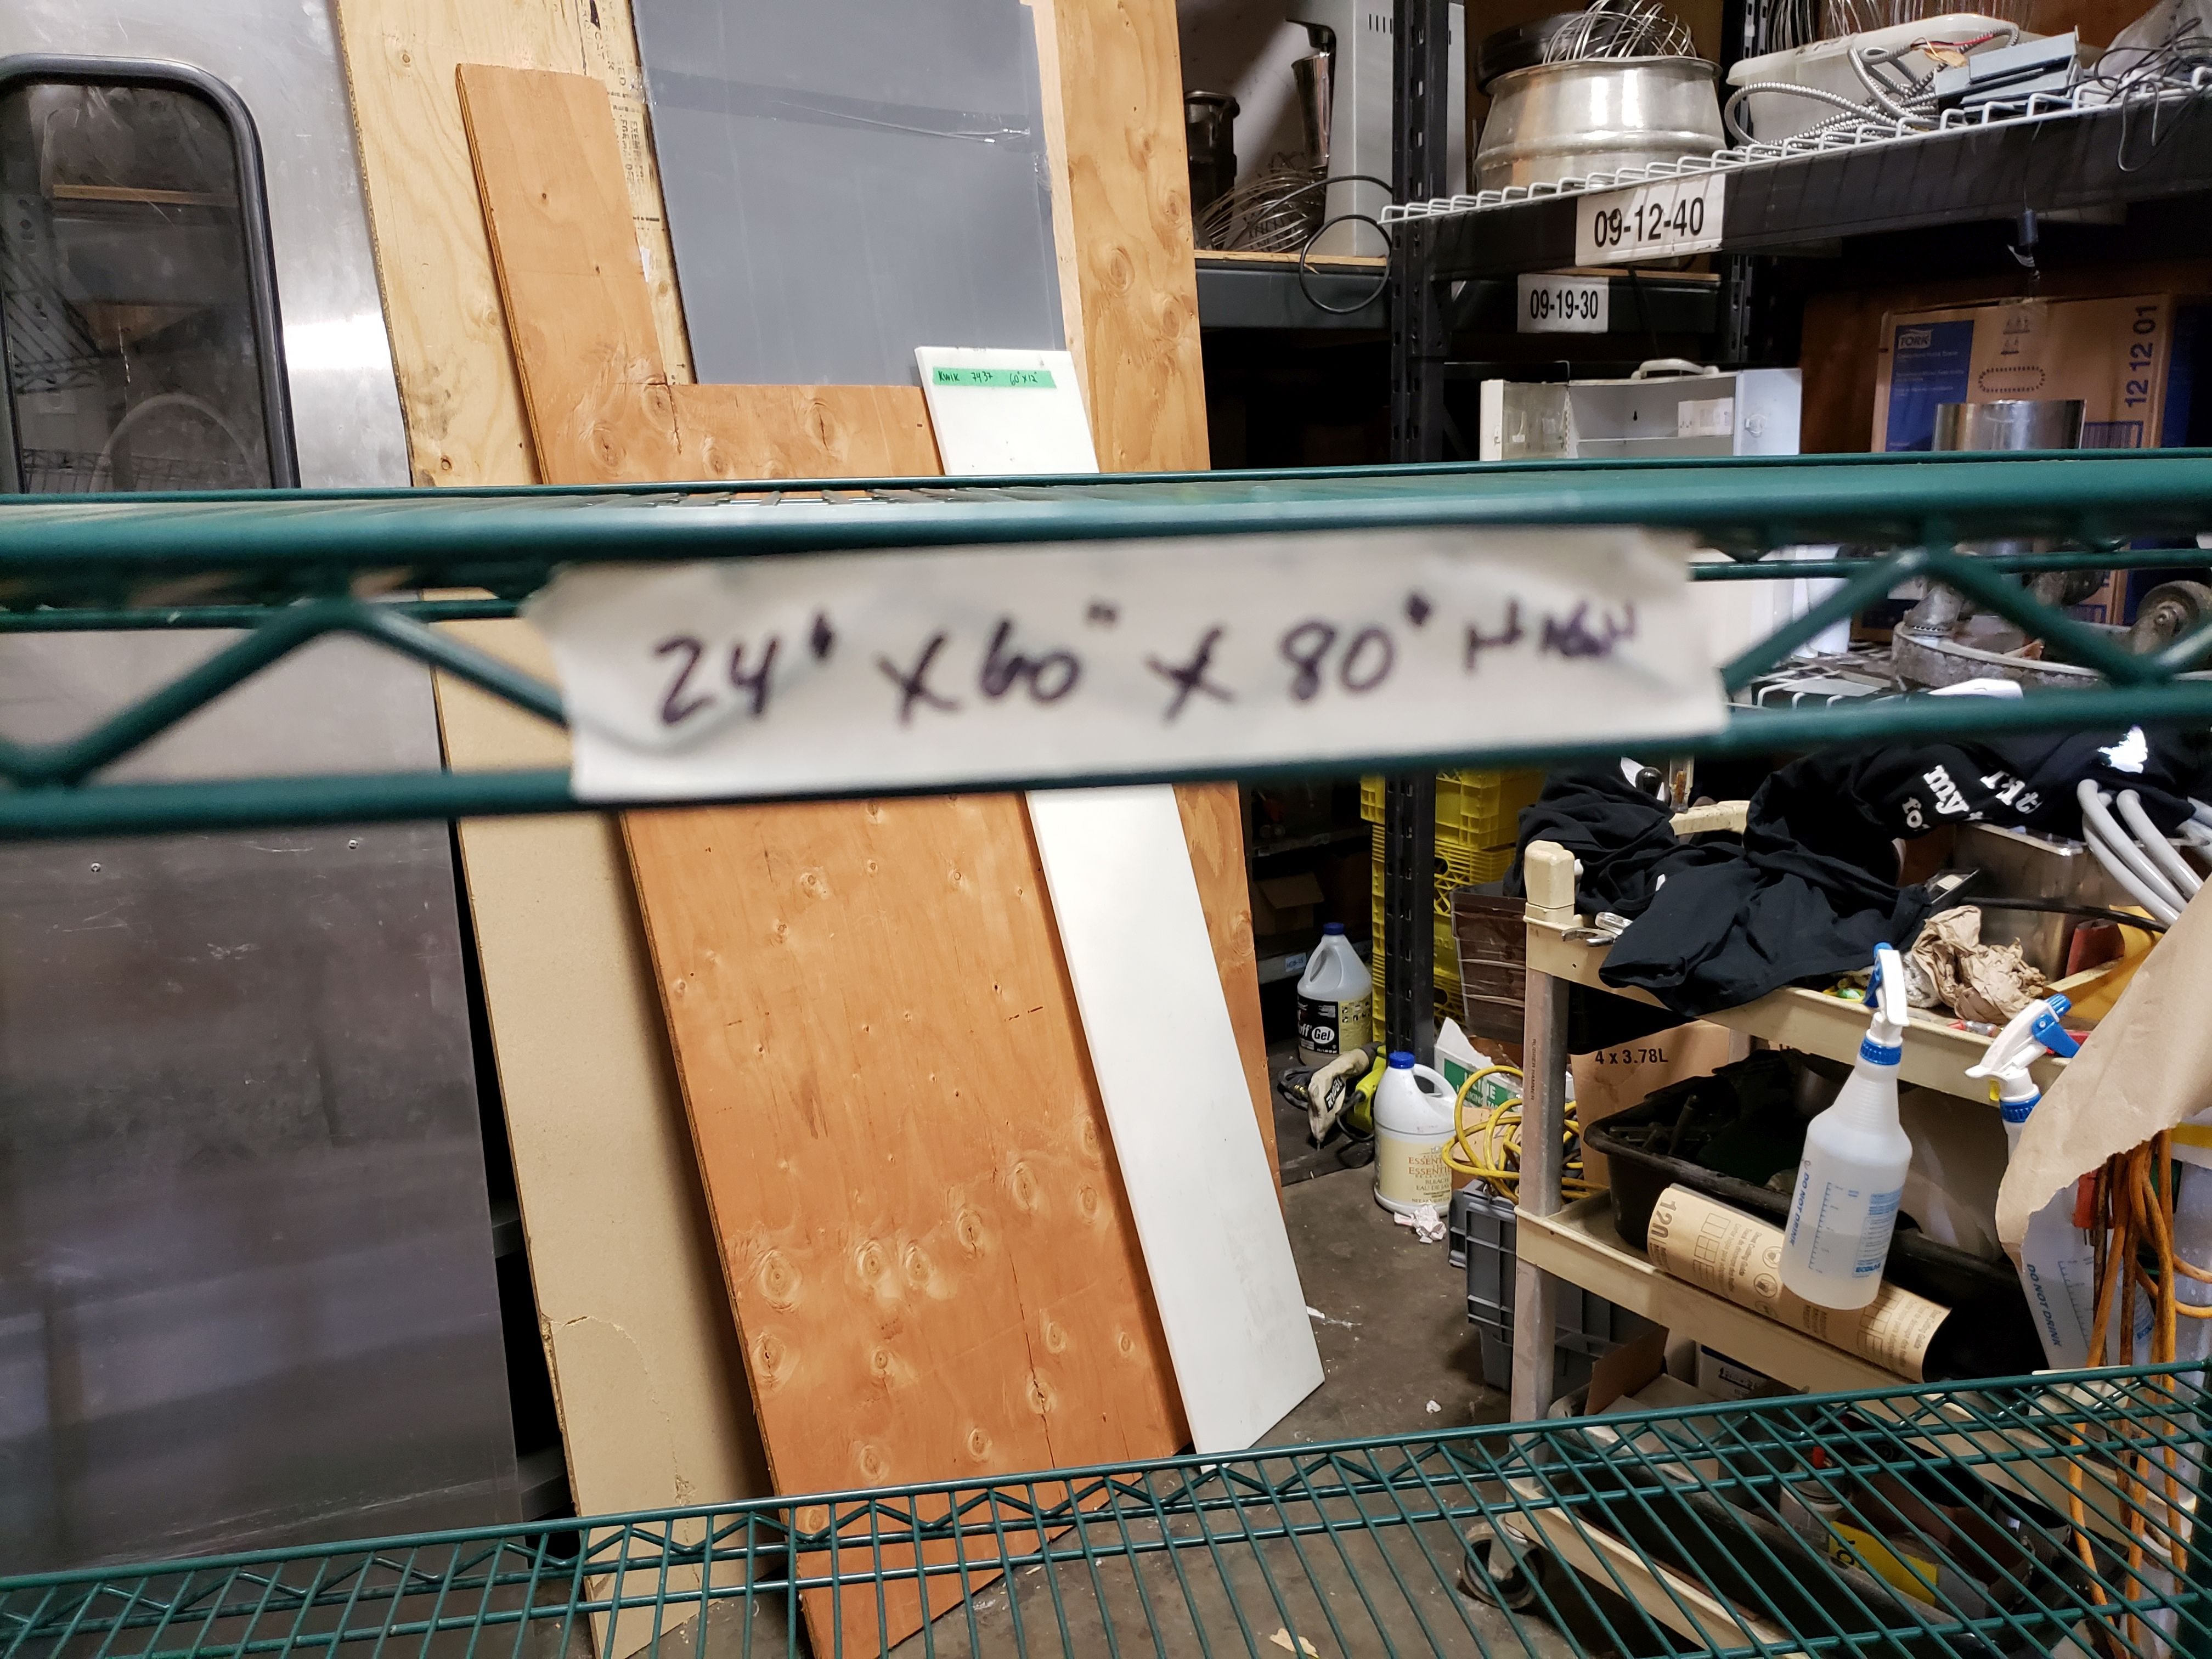 "Lot 13 - 24"" x 60"" x 80"" High Green Epoxy 4 Shelf Rack on Casters"